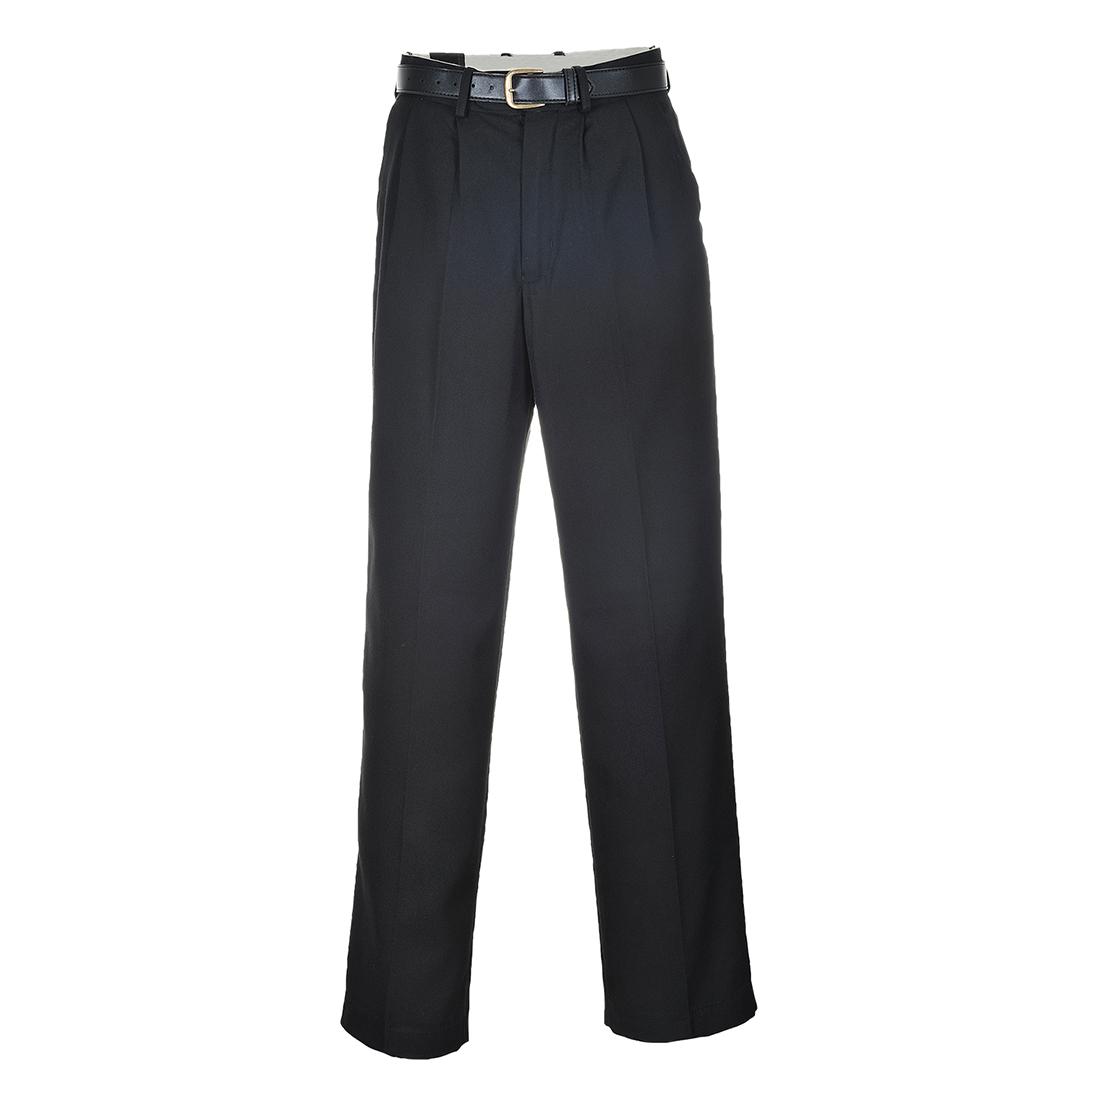 London Trousers Black 44R